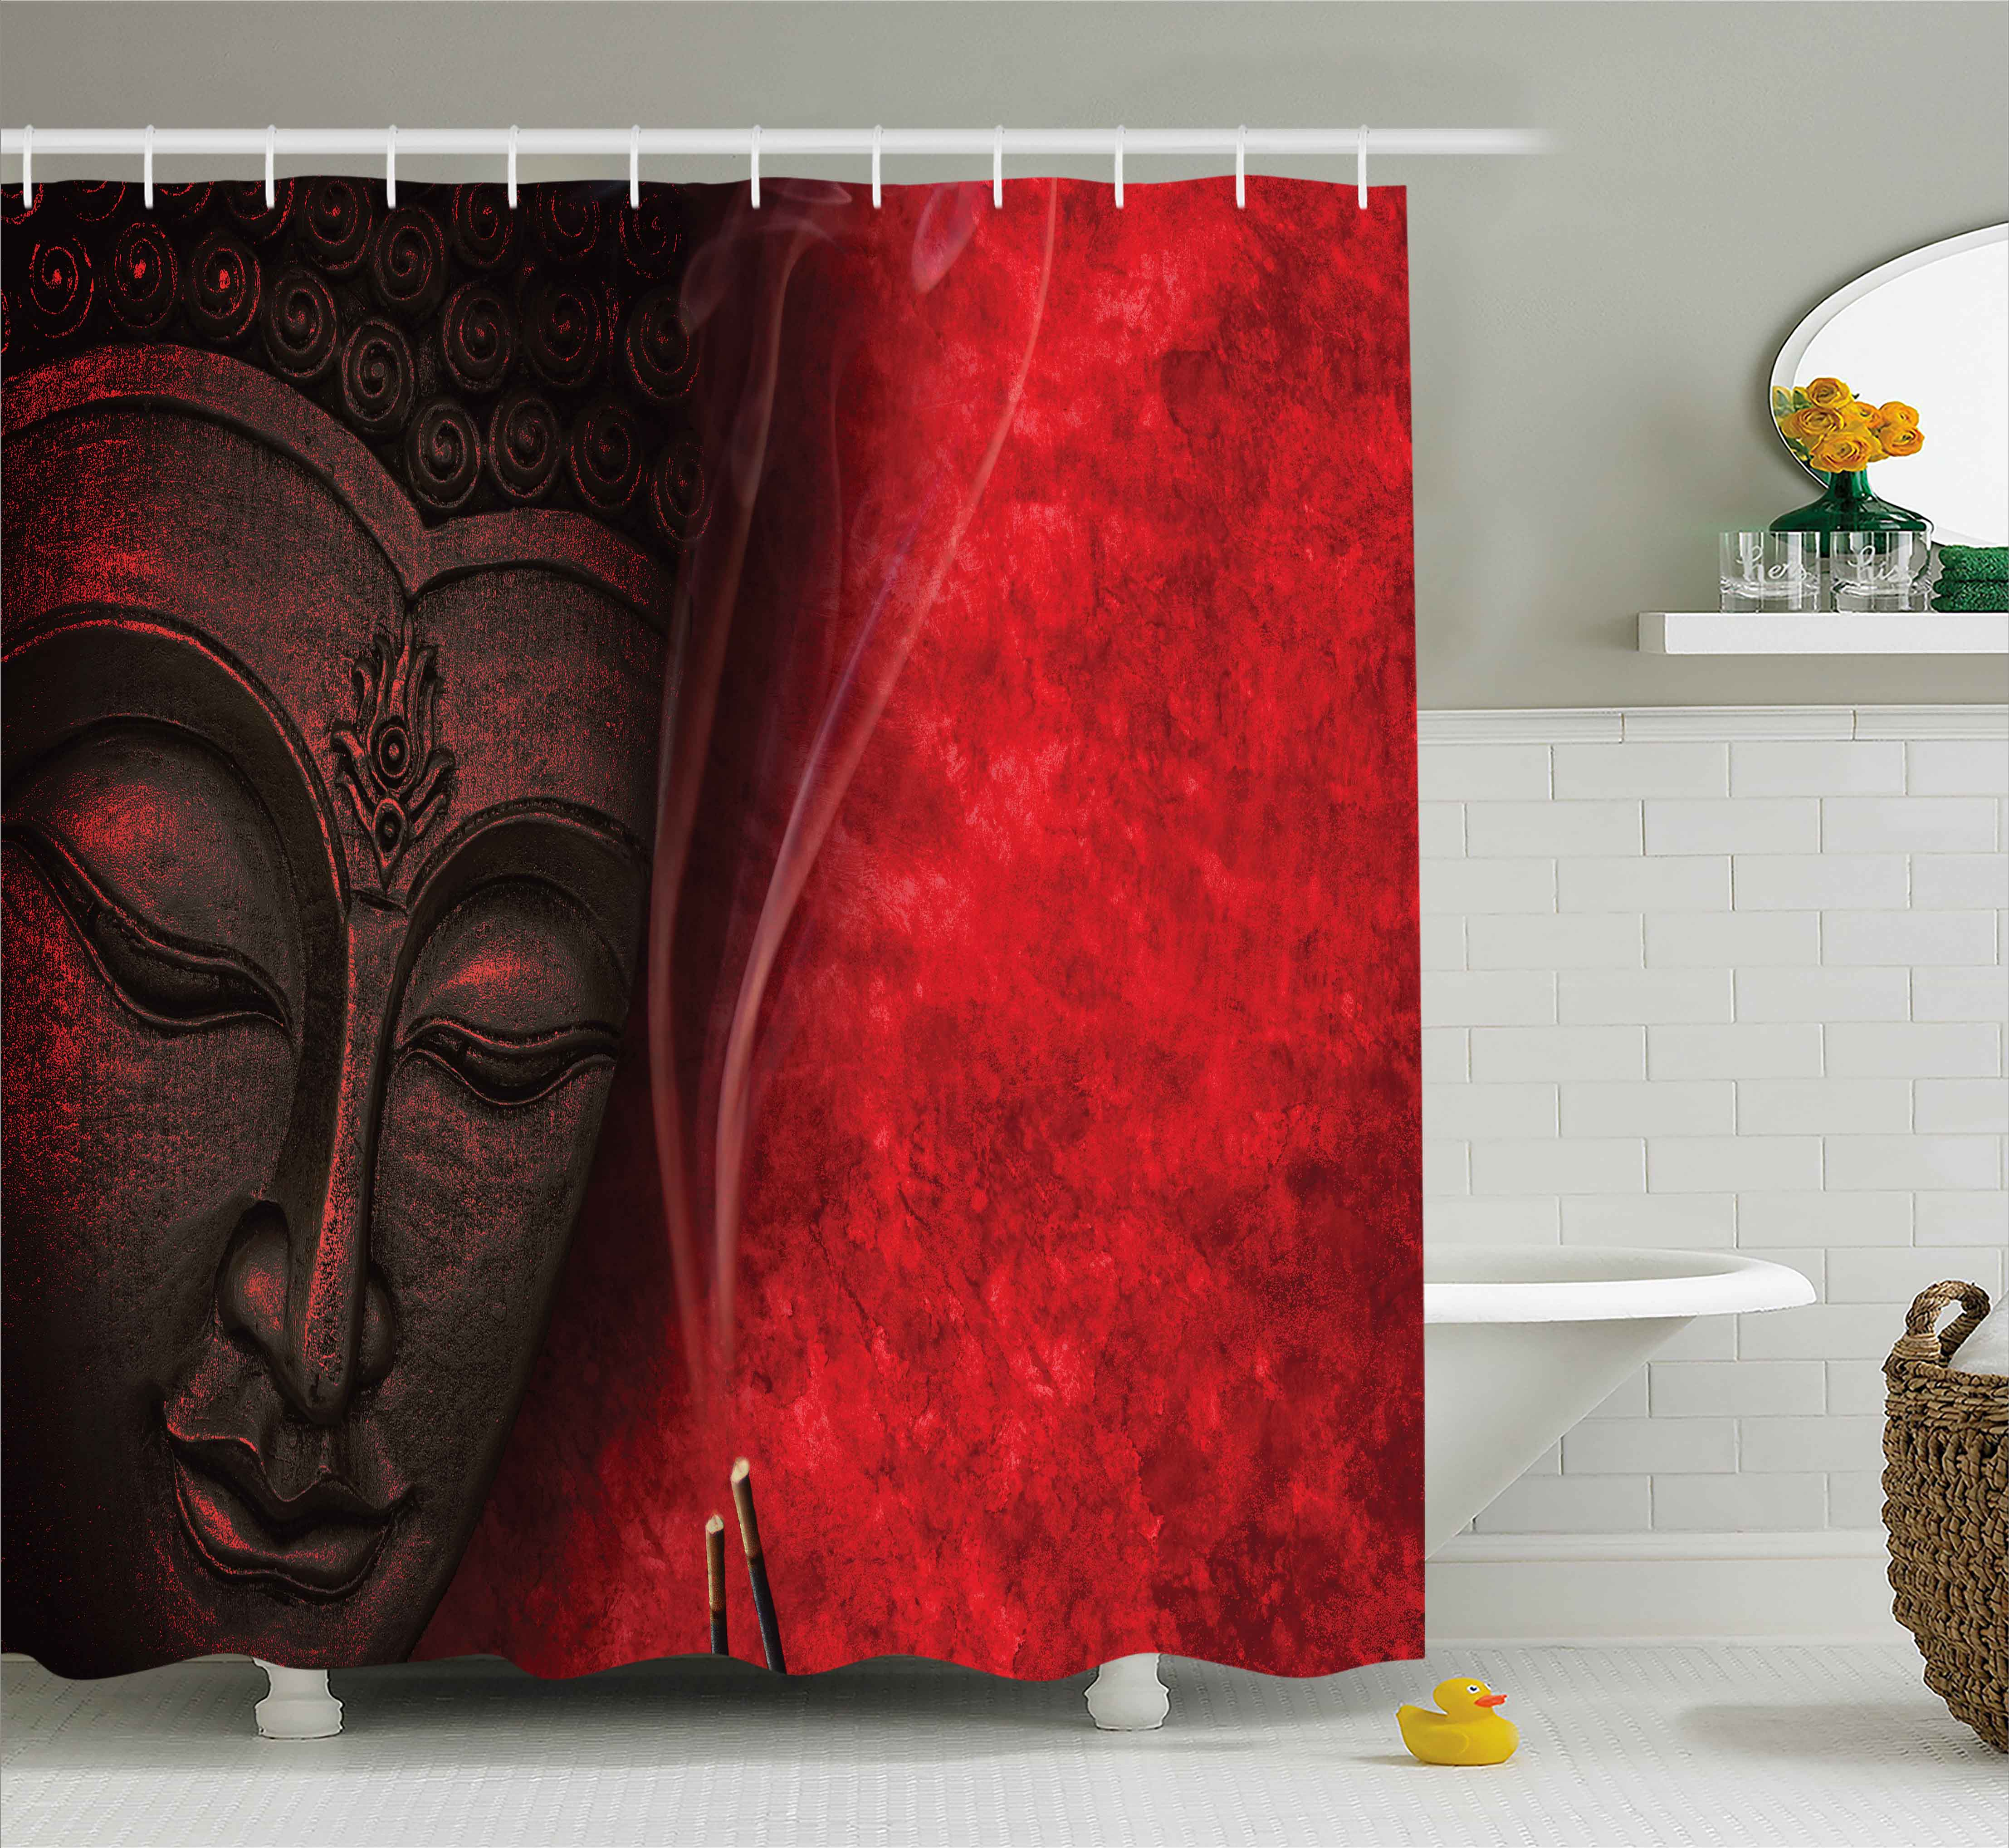 Asian Shower Curtain, Eastern Spirituality Deity Icon Statue over Hazy Religious Zen Yoga Calmness IMage Print, Fabric... by Kozmos